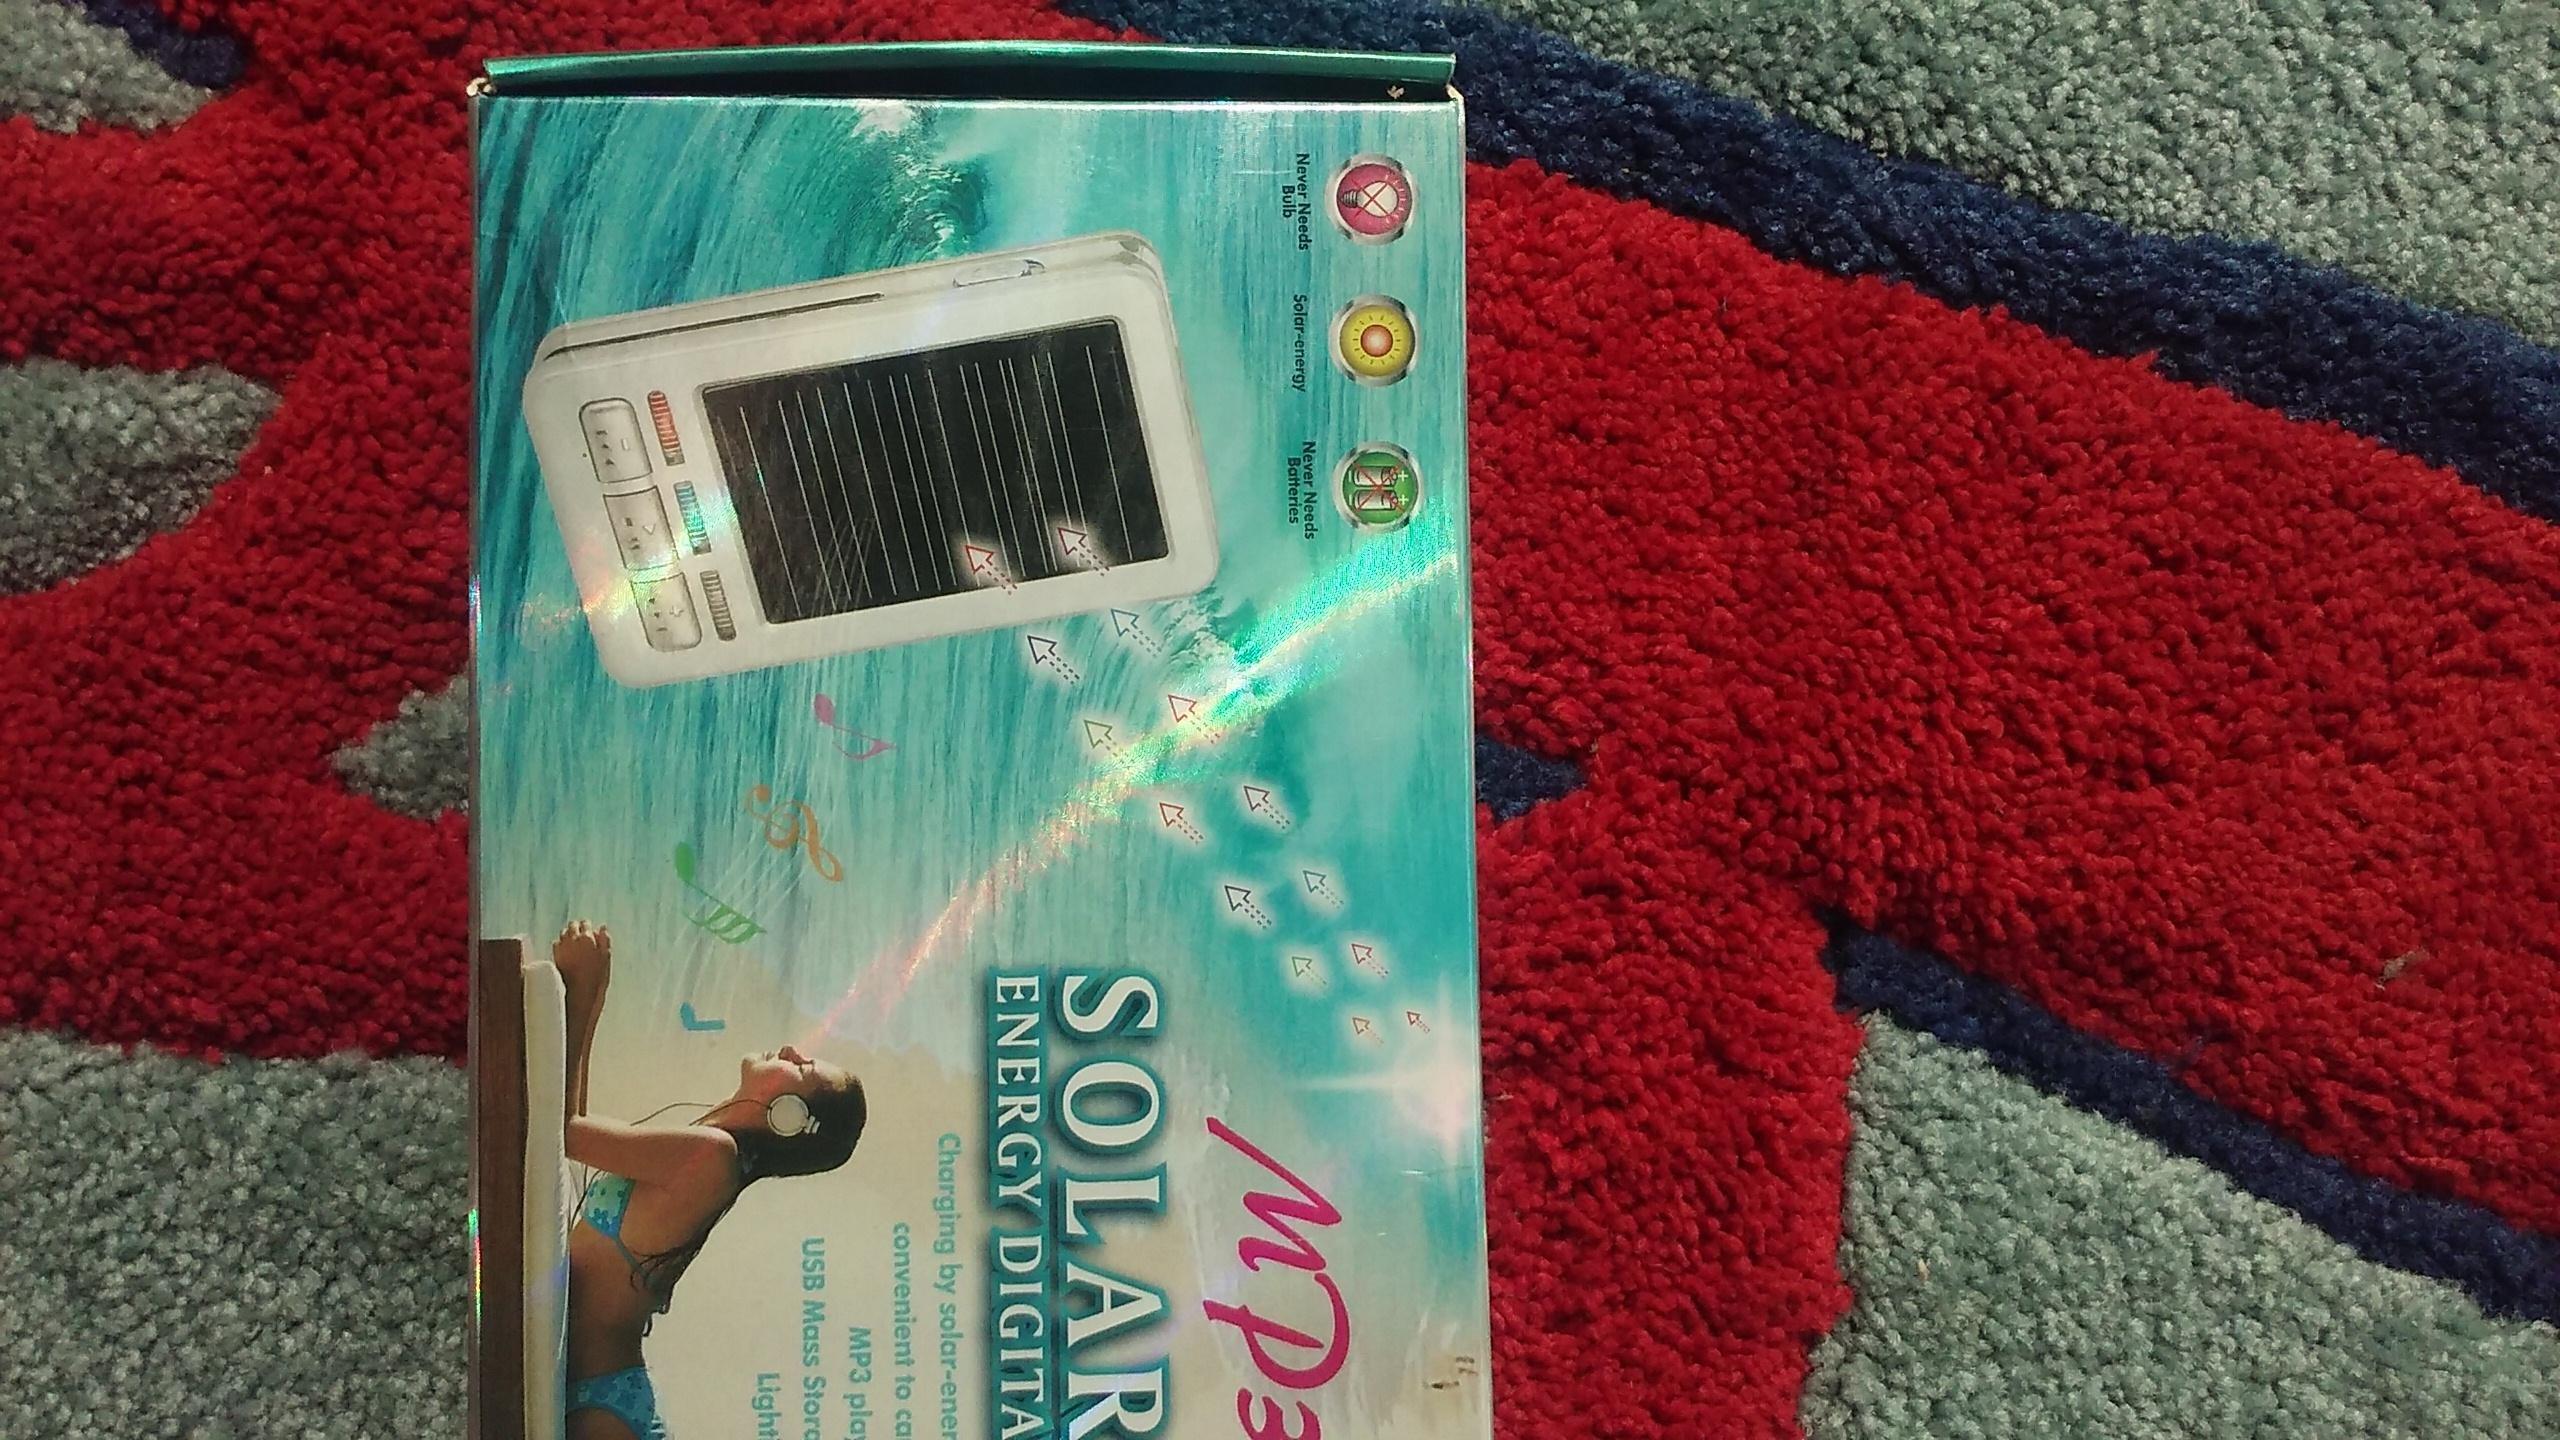 1PC MP3 PLAYER SOLAR ENERGY DIGITAL MP3SOL02 by LDB